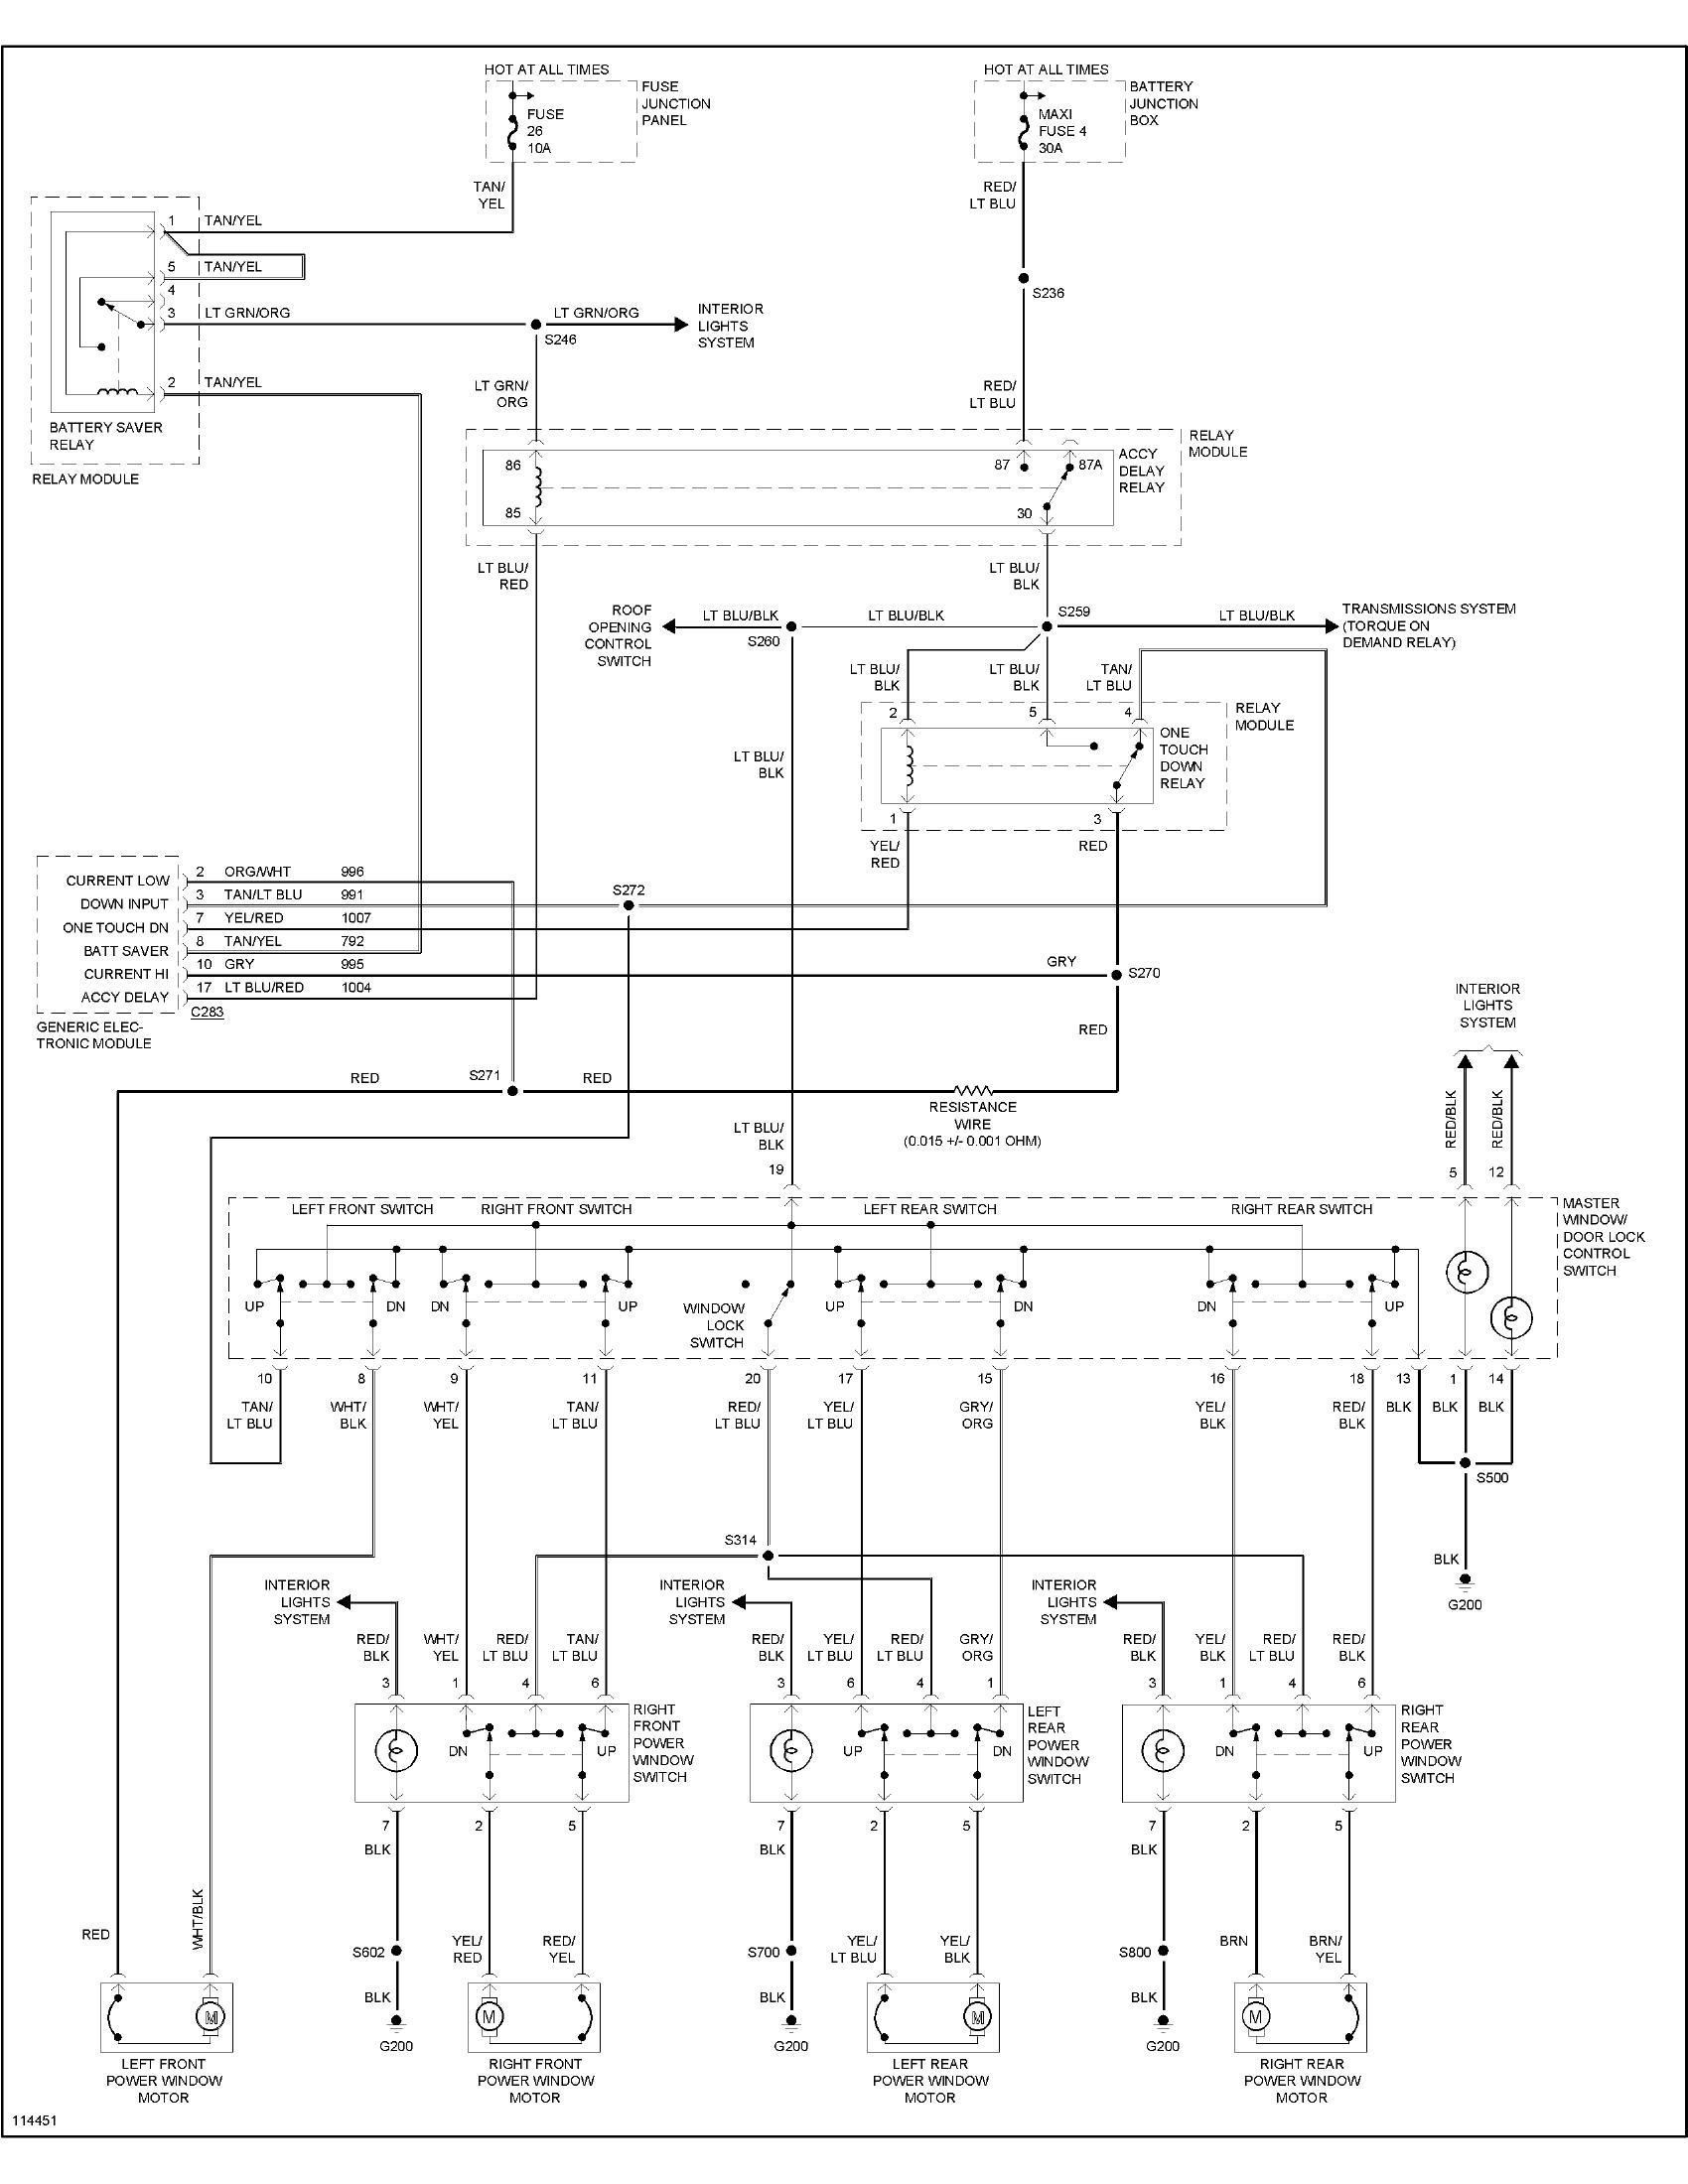 1999 ford Explorer Engine Diagram 1999 Explorer Wiring Diagram Wiring Diagram Database Of 1999 ford Explorer Engine Diagram